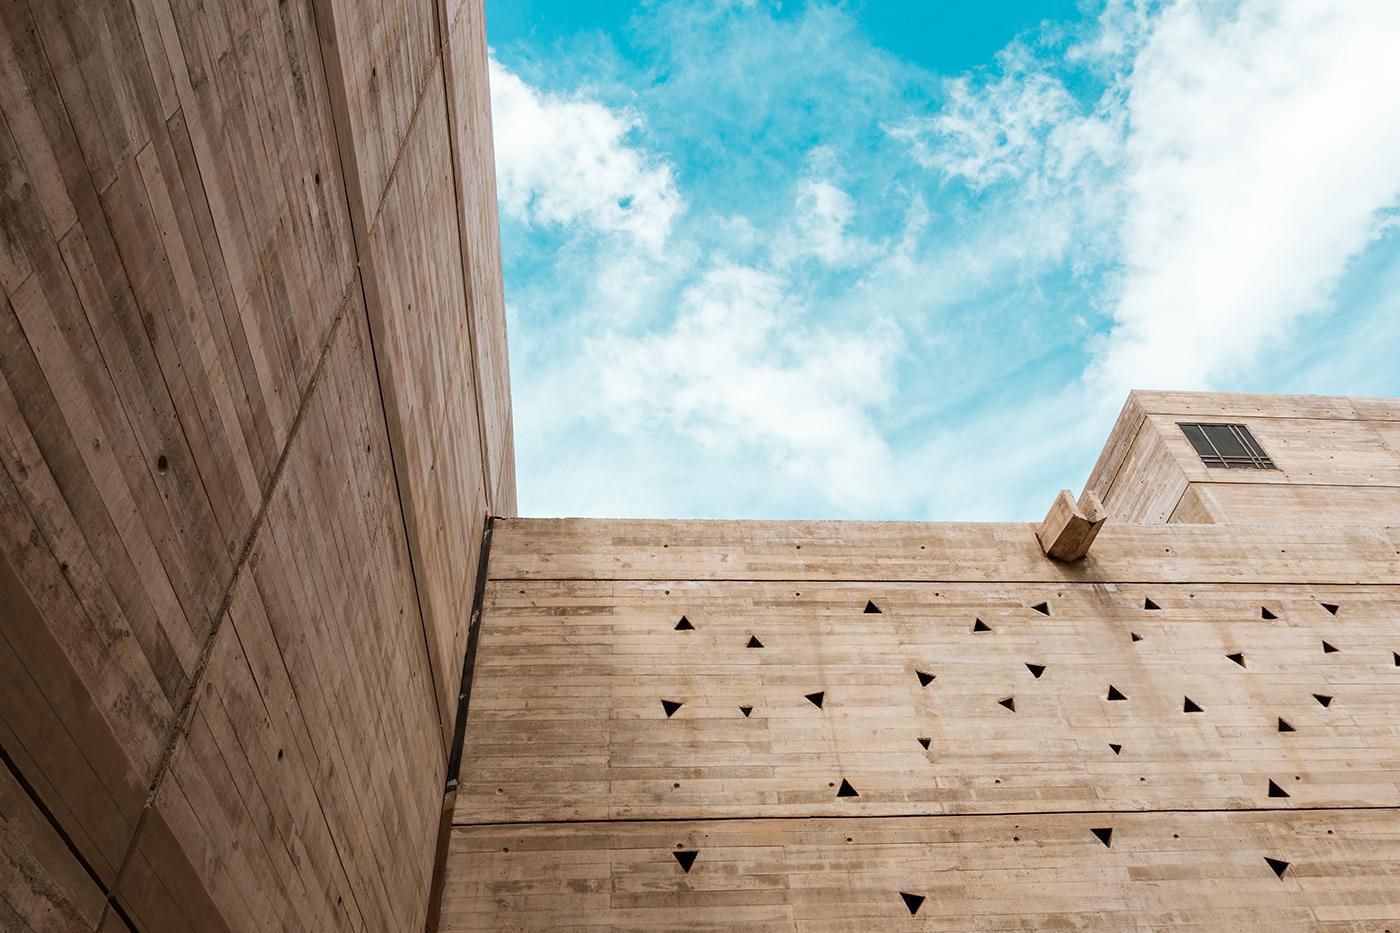 oaxaca mexico arquitectura architect lines minimal shadow light symmetry clean